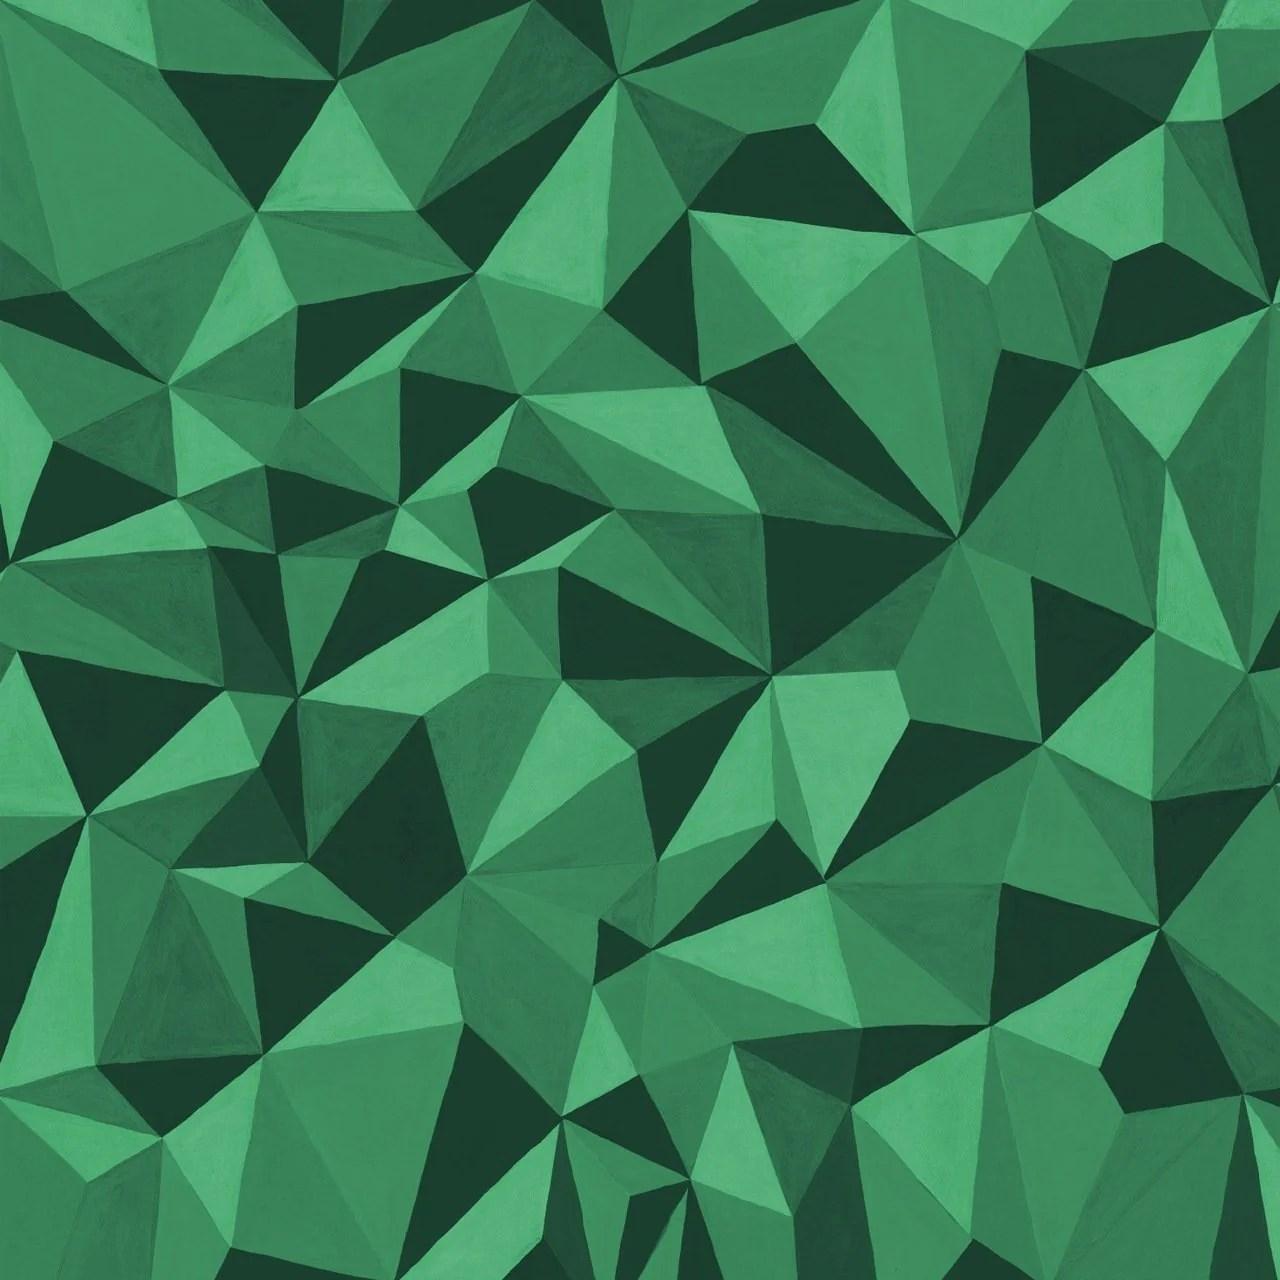 Curio Emerald Green 3d Geometric Wallpaper Quartz By Cole And Son